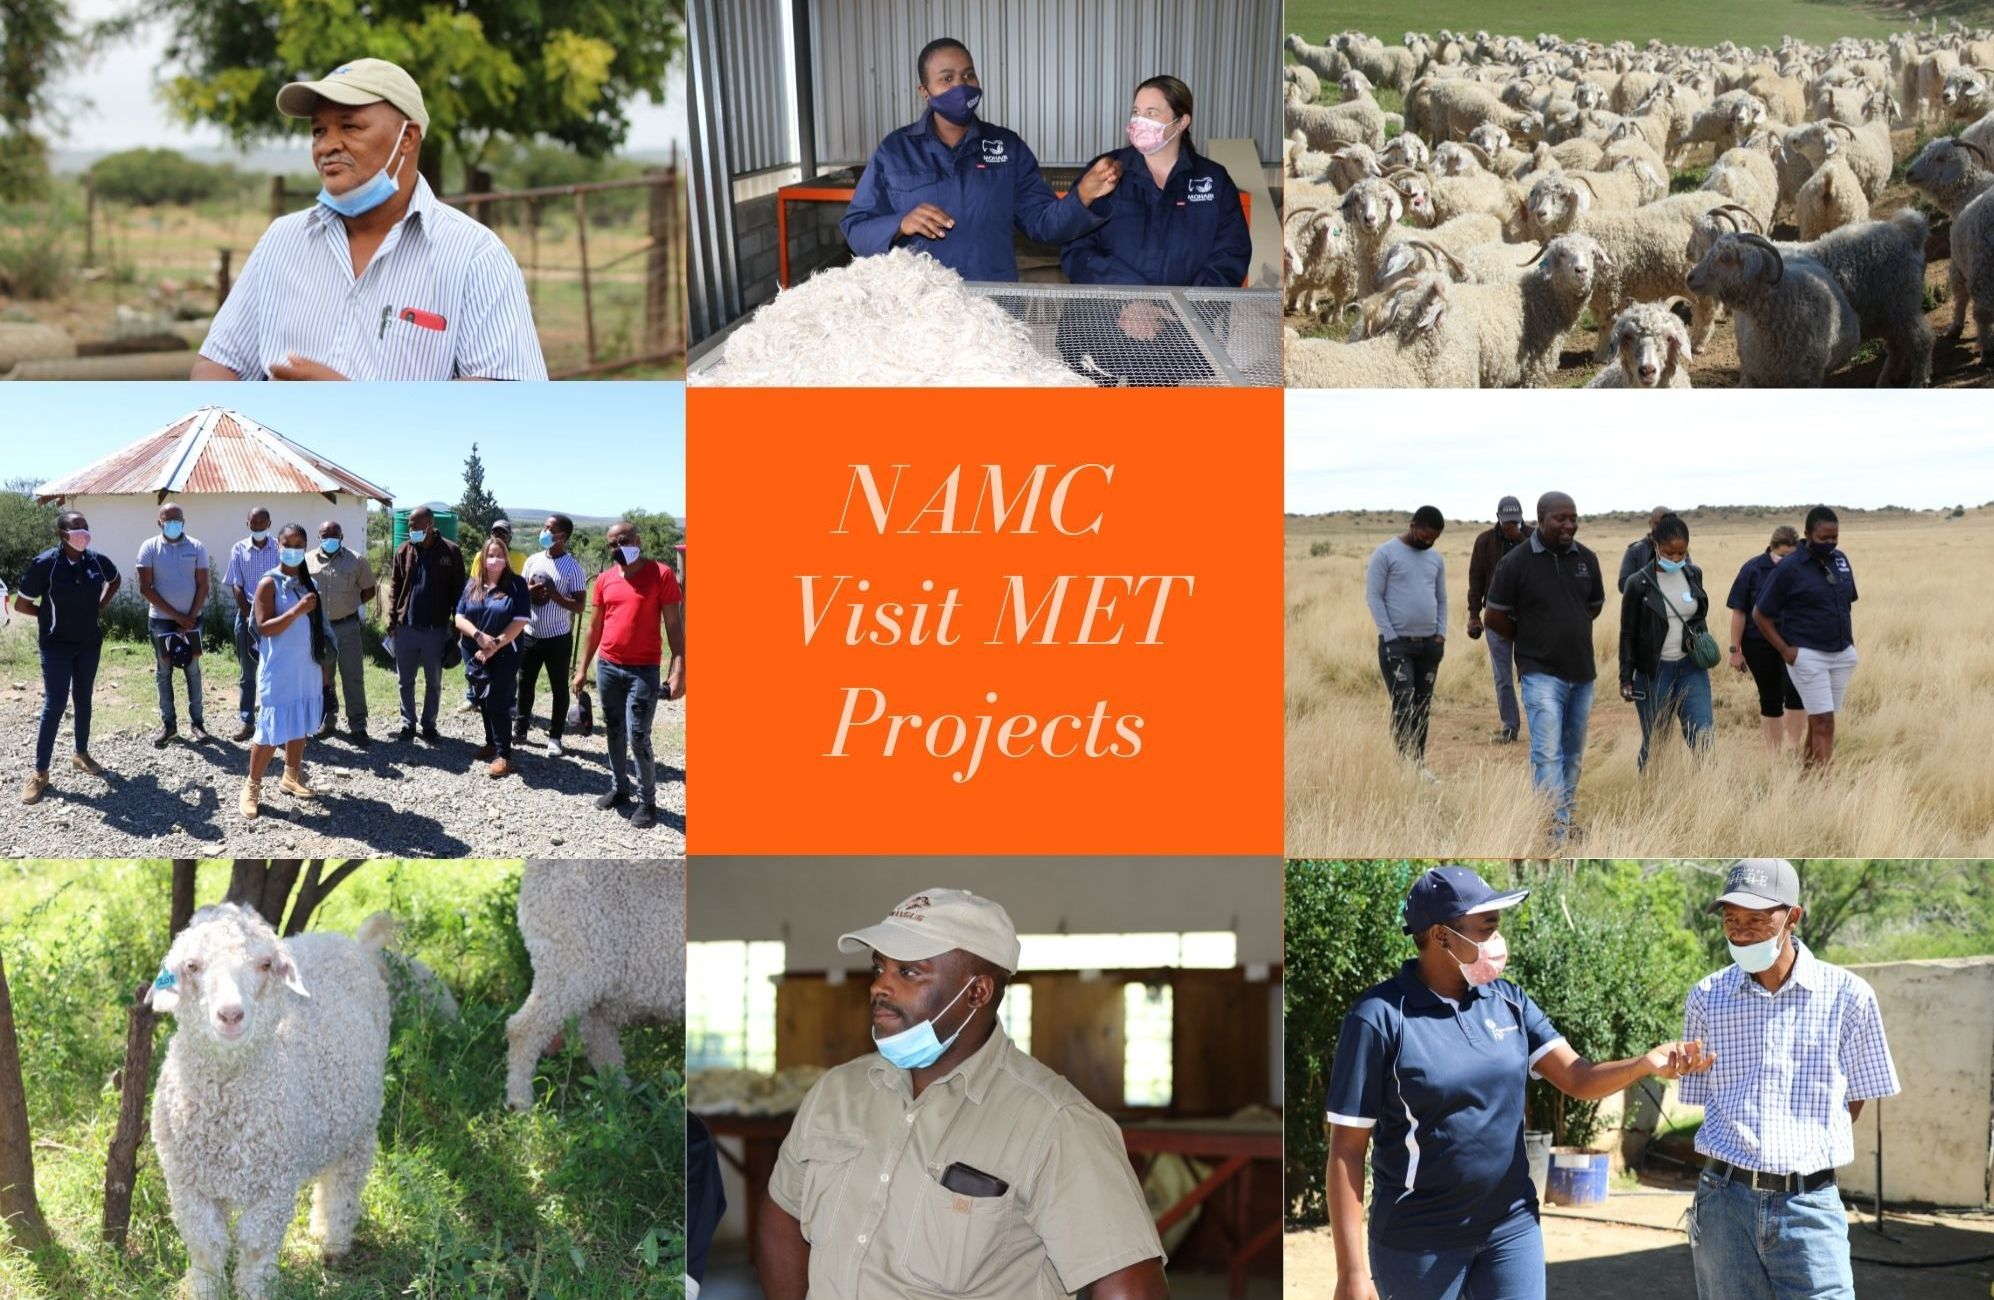 namc_visit_crop